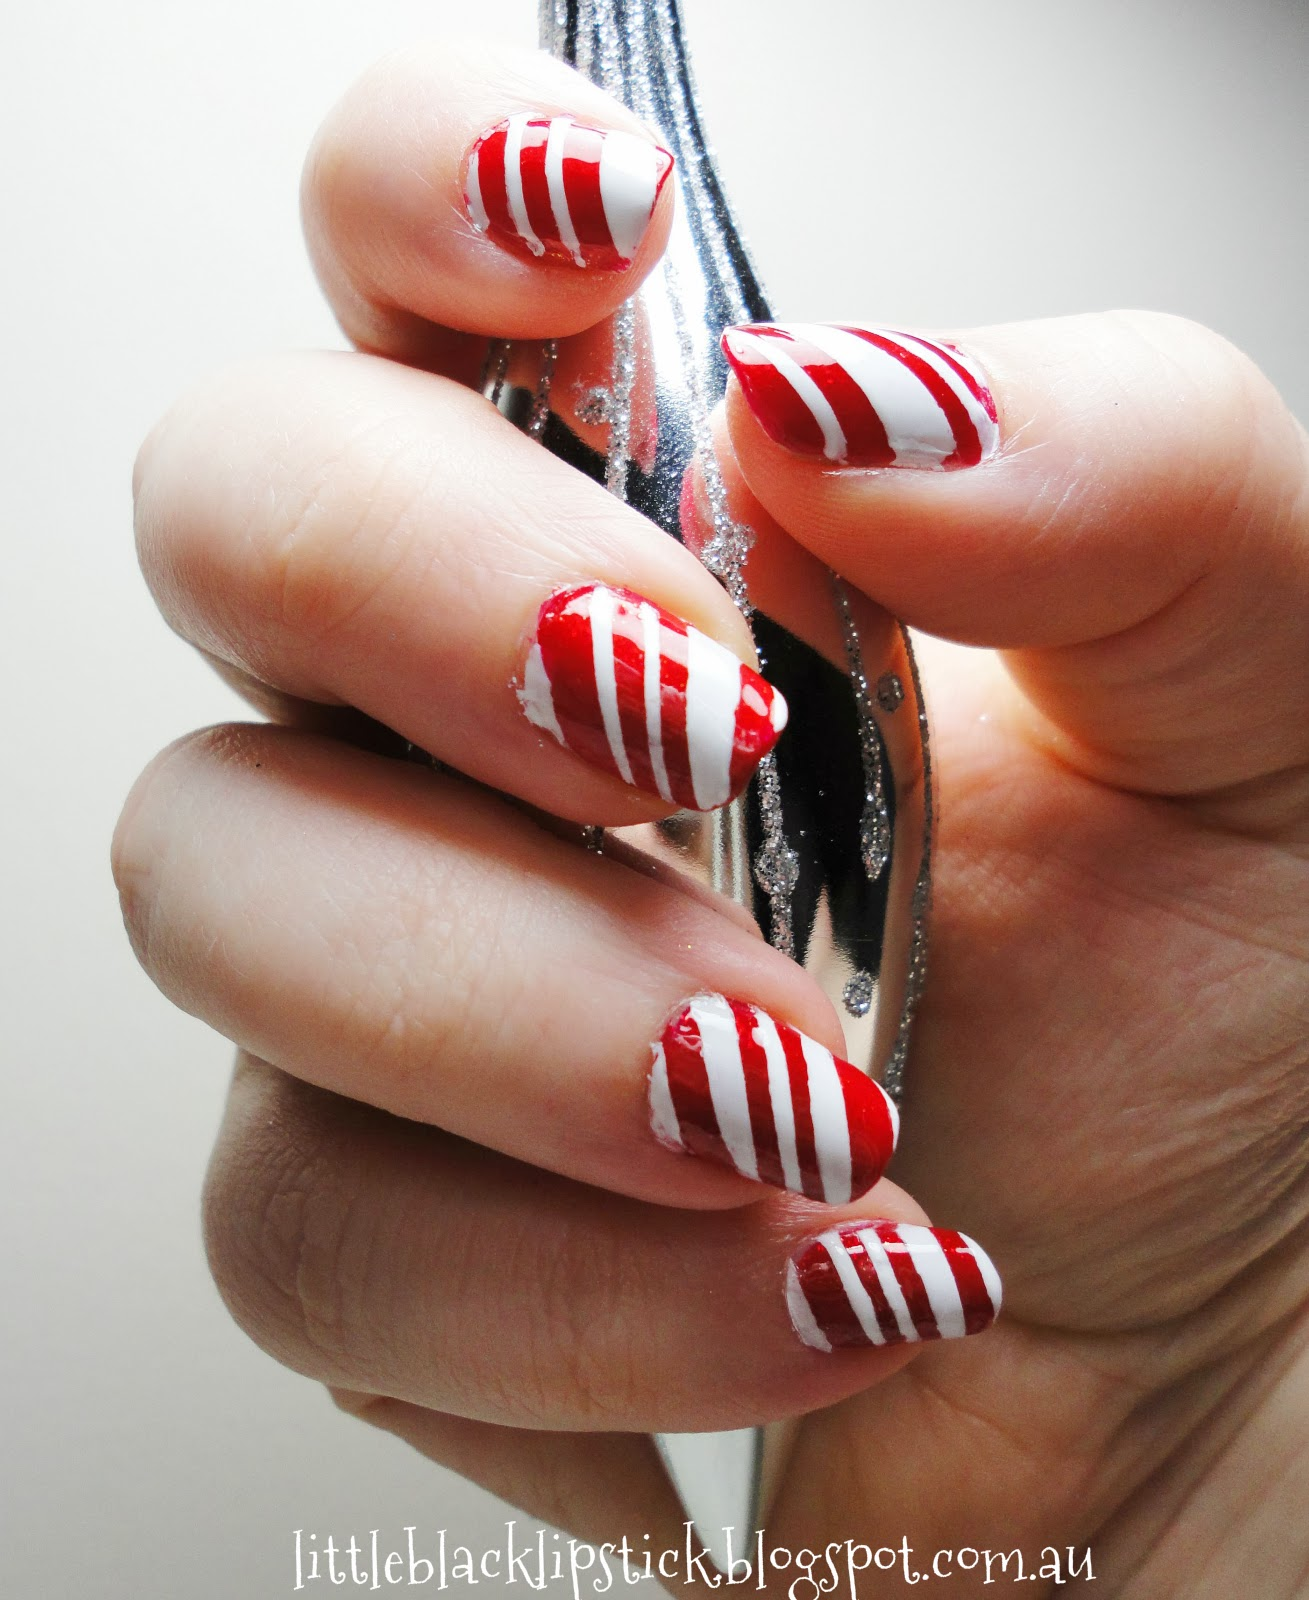 Easy Christmas Nail Art Designs Tutorial: Little Black Lipstick: Easy Candy Cane Christmas Nail Art